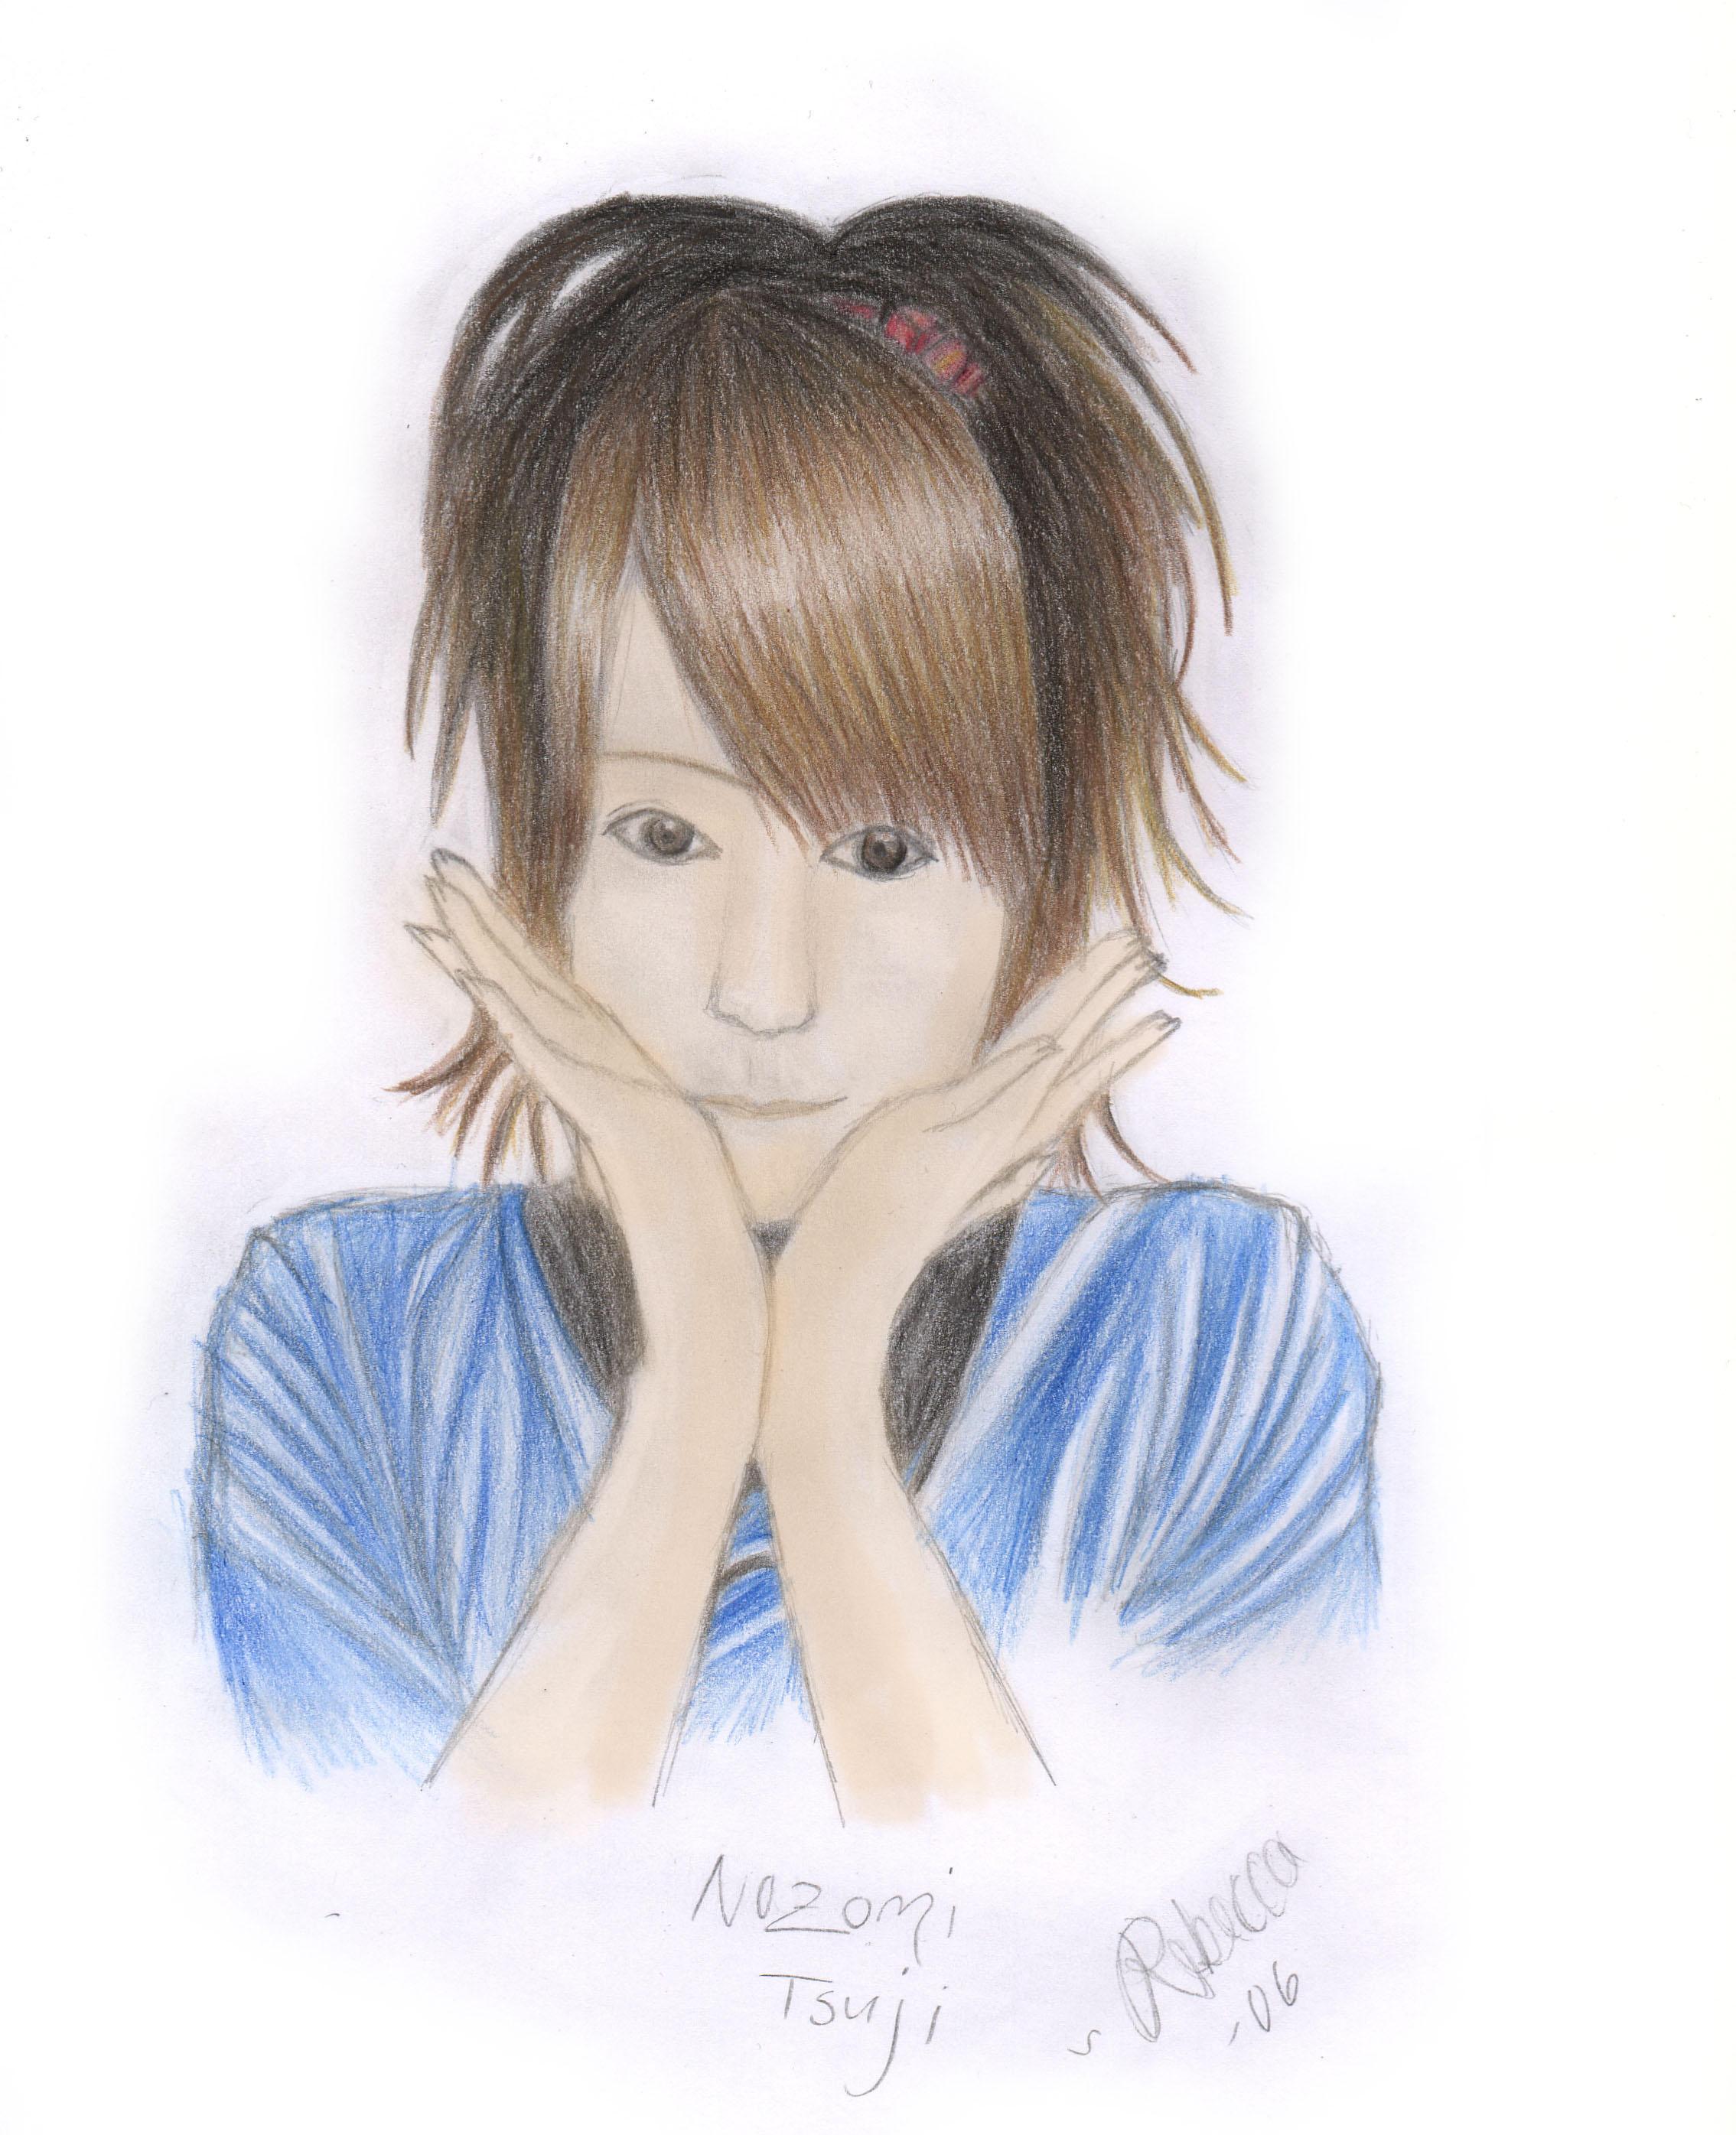 Tsuji Nozomi by Ayameha on DeviantArt